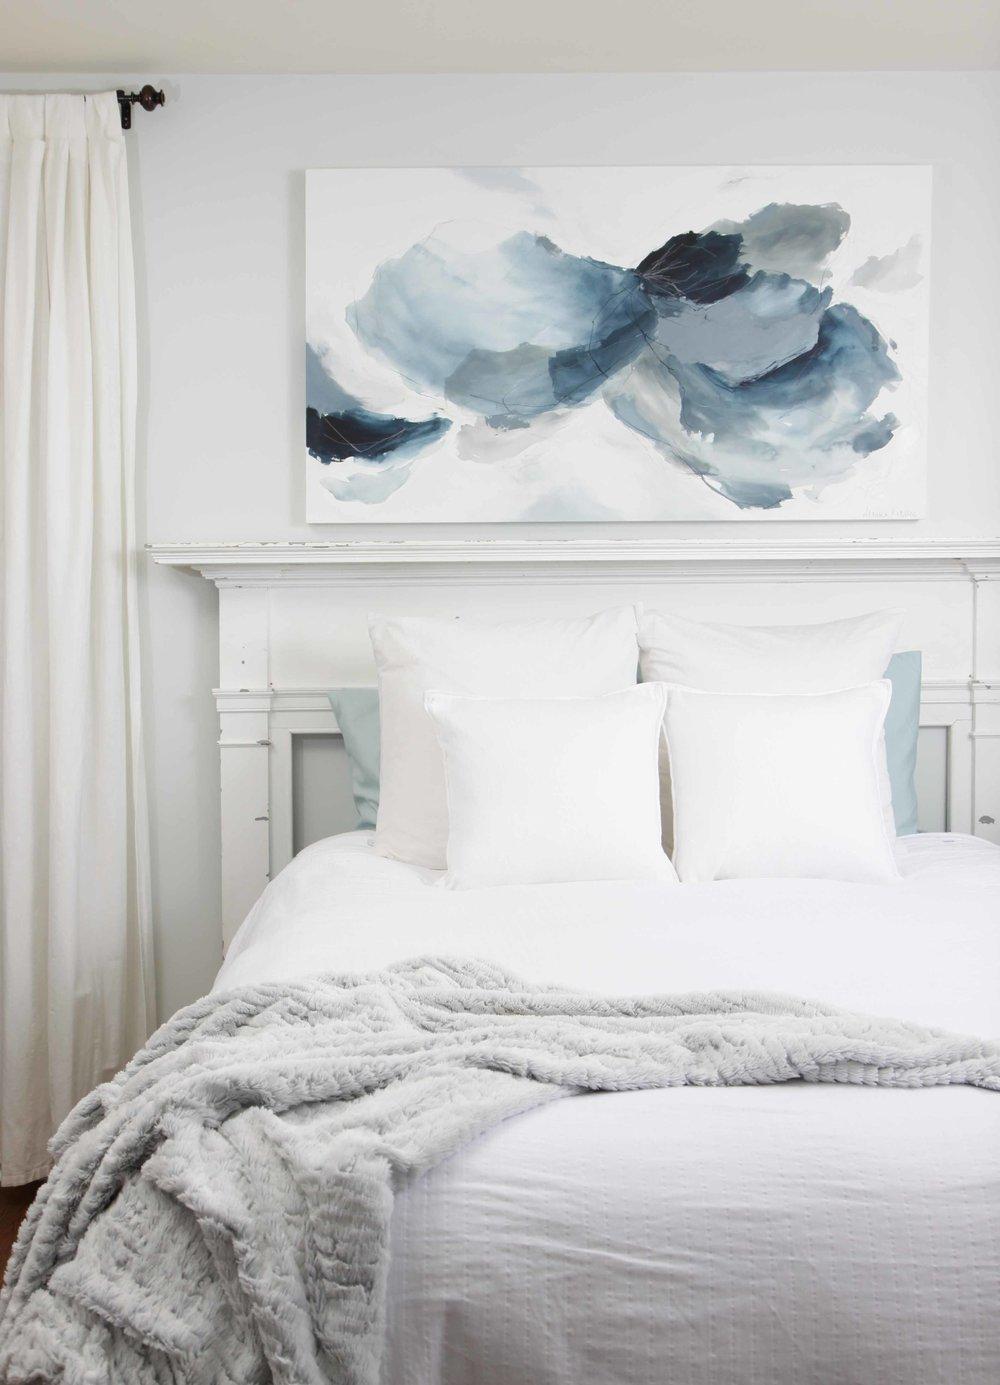 30x54-abstract-custom-painting-above-bed-deeann-rieves.jpg